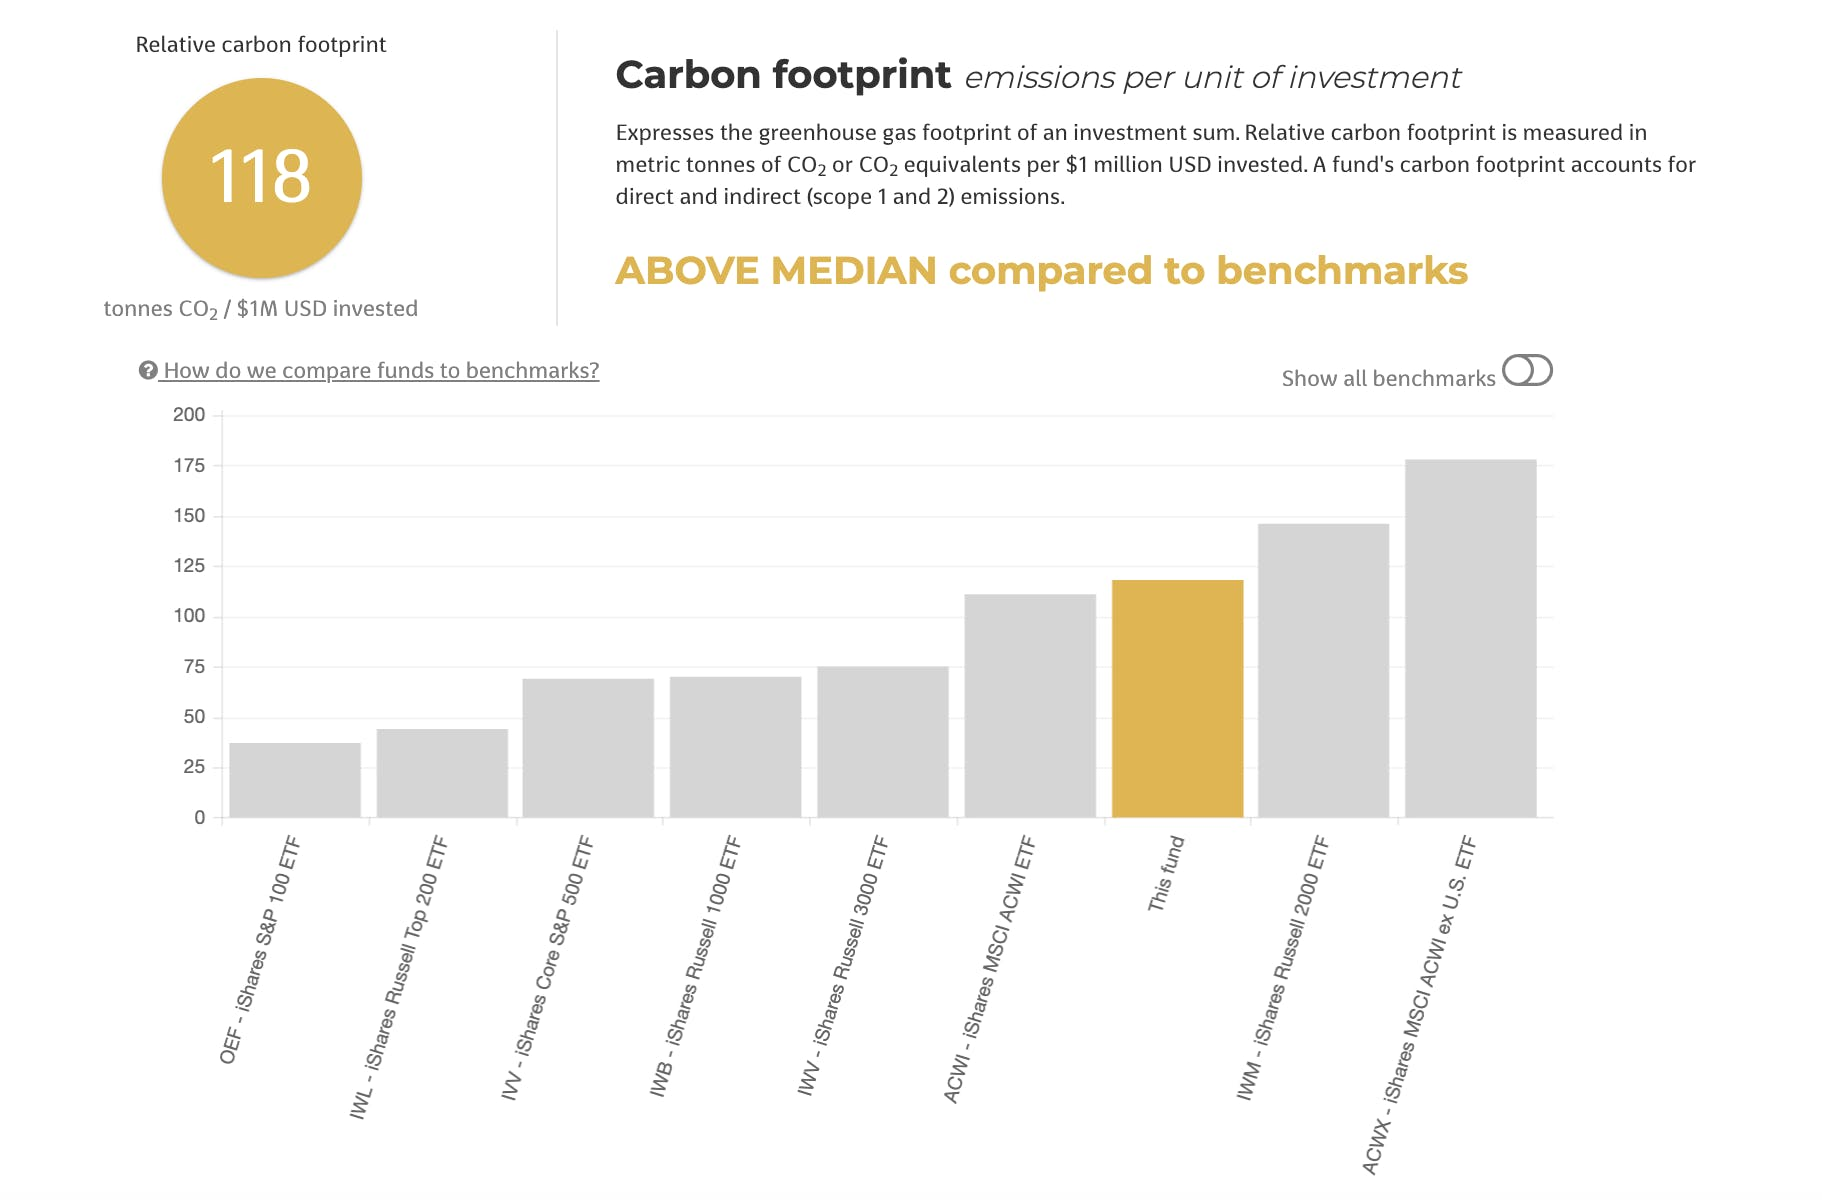 Carbon footprint emissions per unit of investment